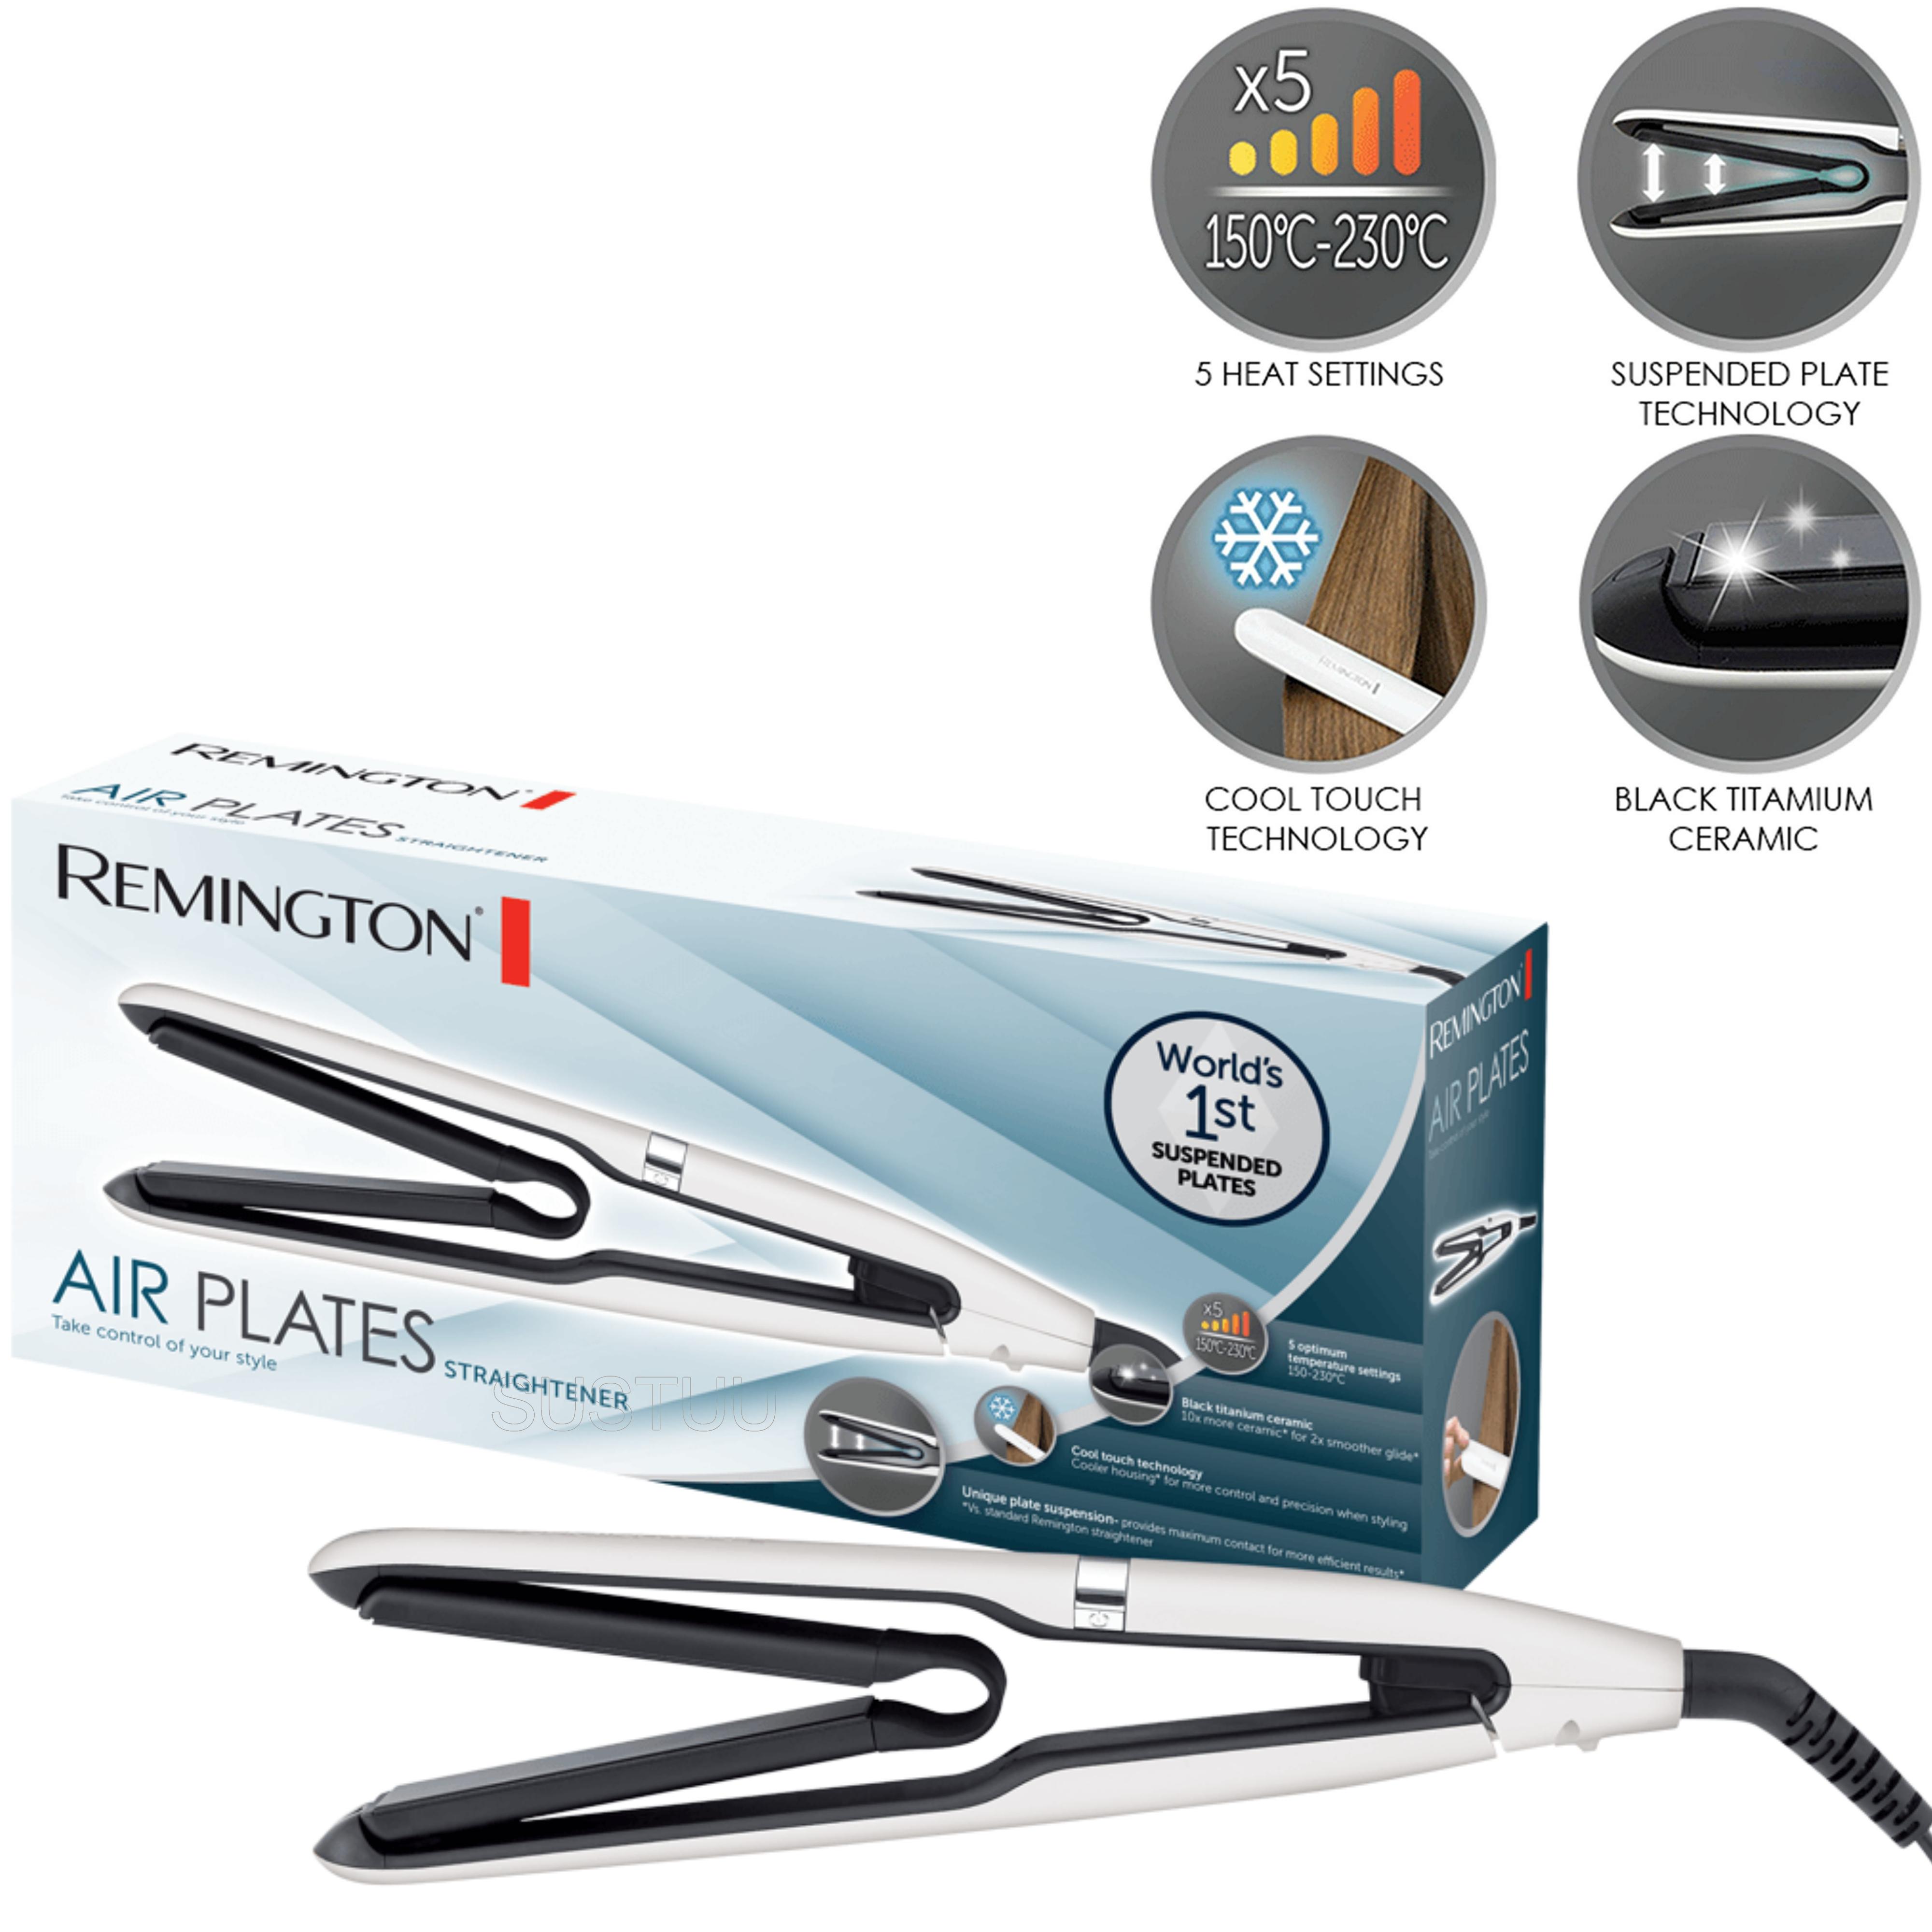 Remington Air Plates Ceramic Hair Straightener | 5 Heat Settings | 230°C | White | S7412